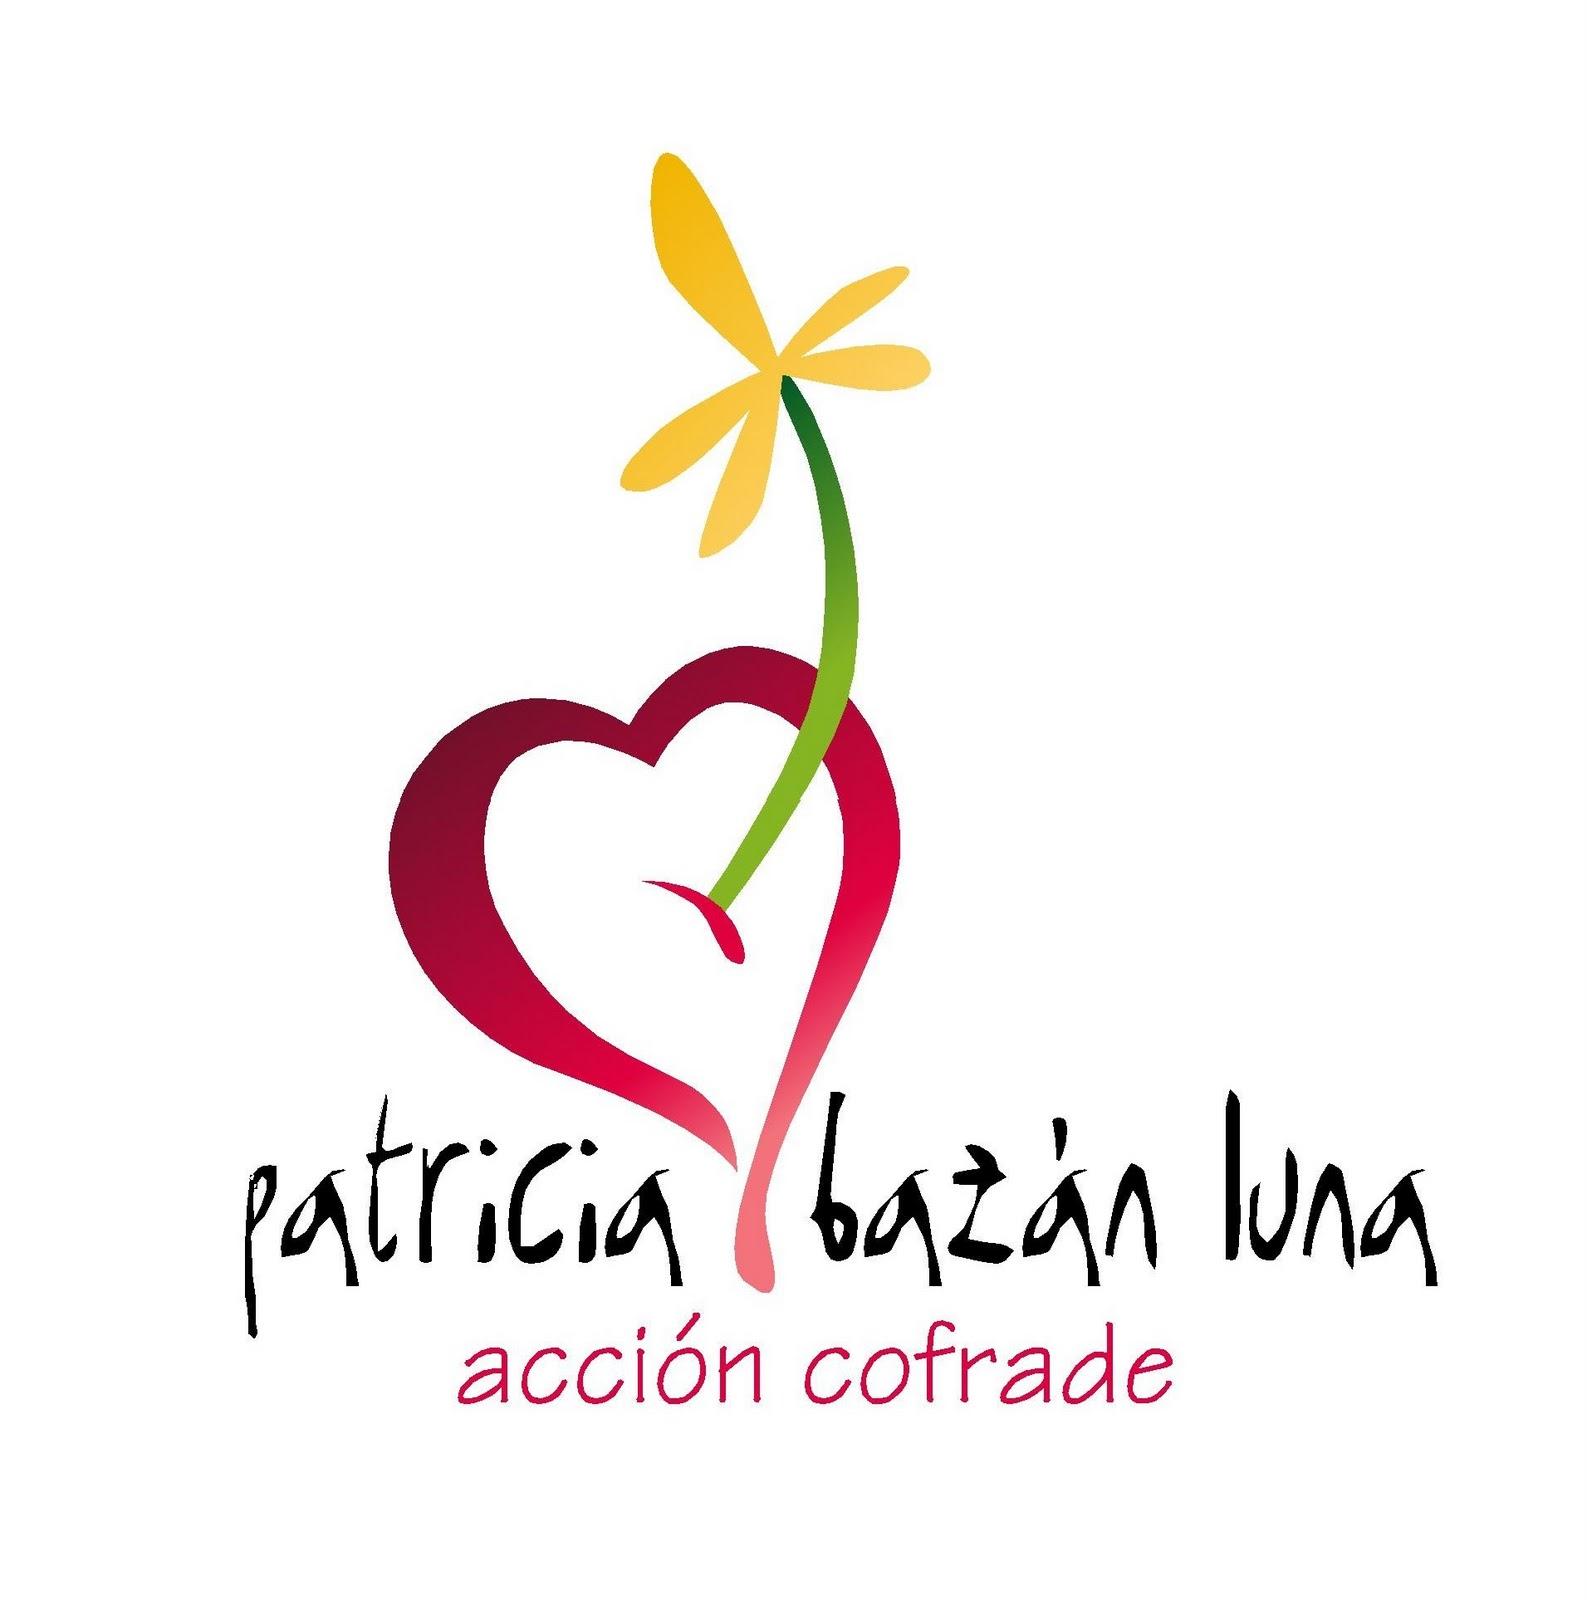 LOGO -PATRICIA BAZAN LUNA-11-10-2011